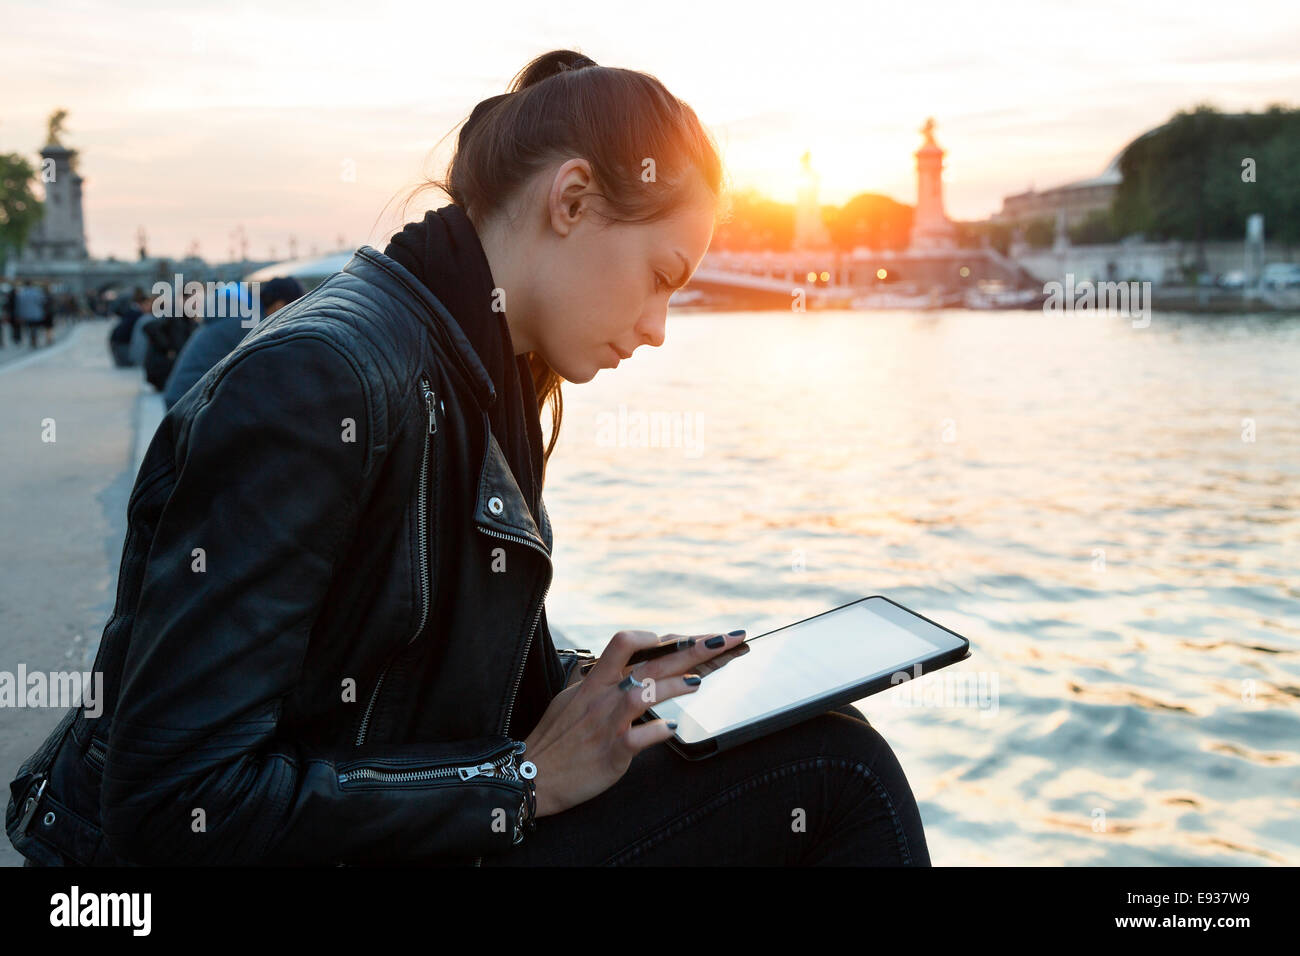 Frau mit Digital-Tablette Stockbild